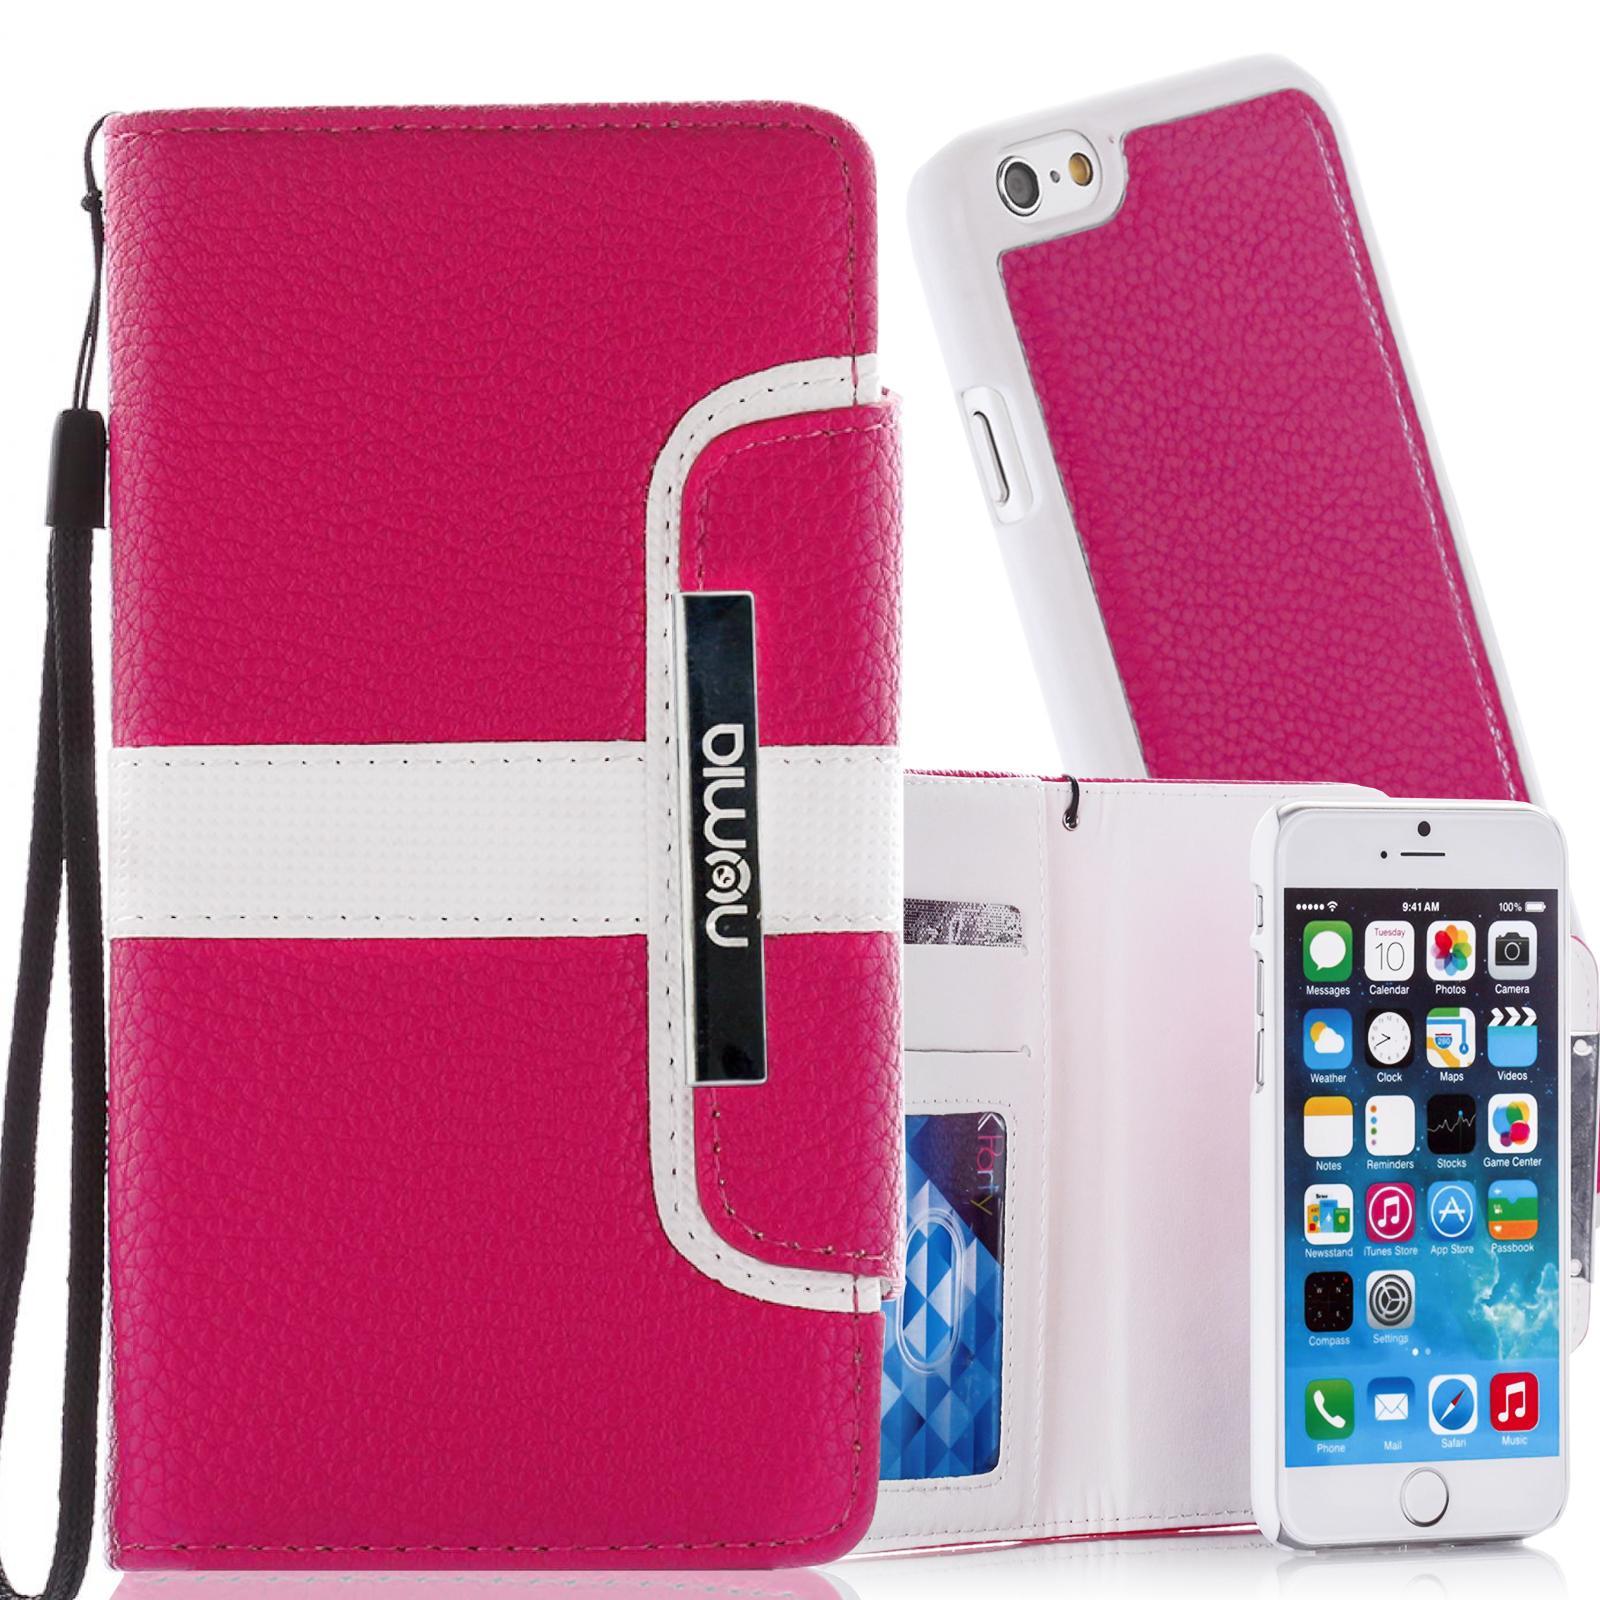 Handy-Tasche-Schutz-Huelle-Flip-Case-Book-Cover-Bumper-Klapp-Etui-Schale-Wallet